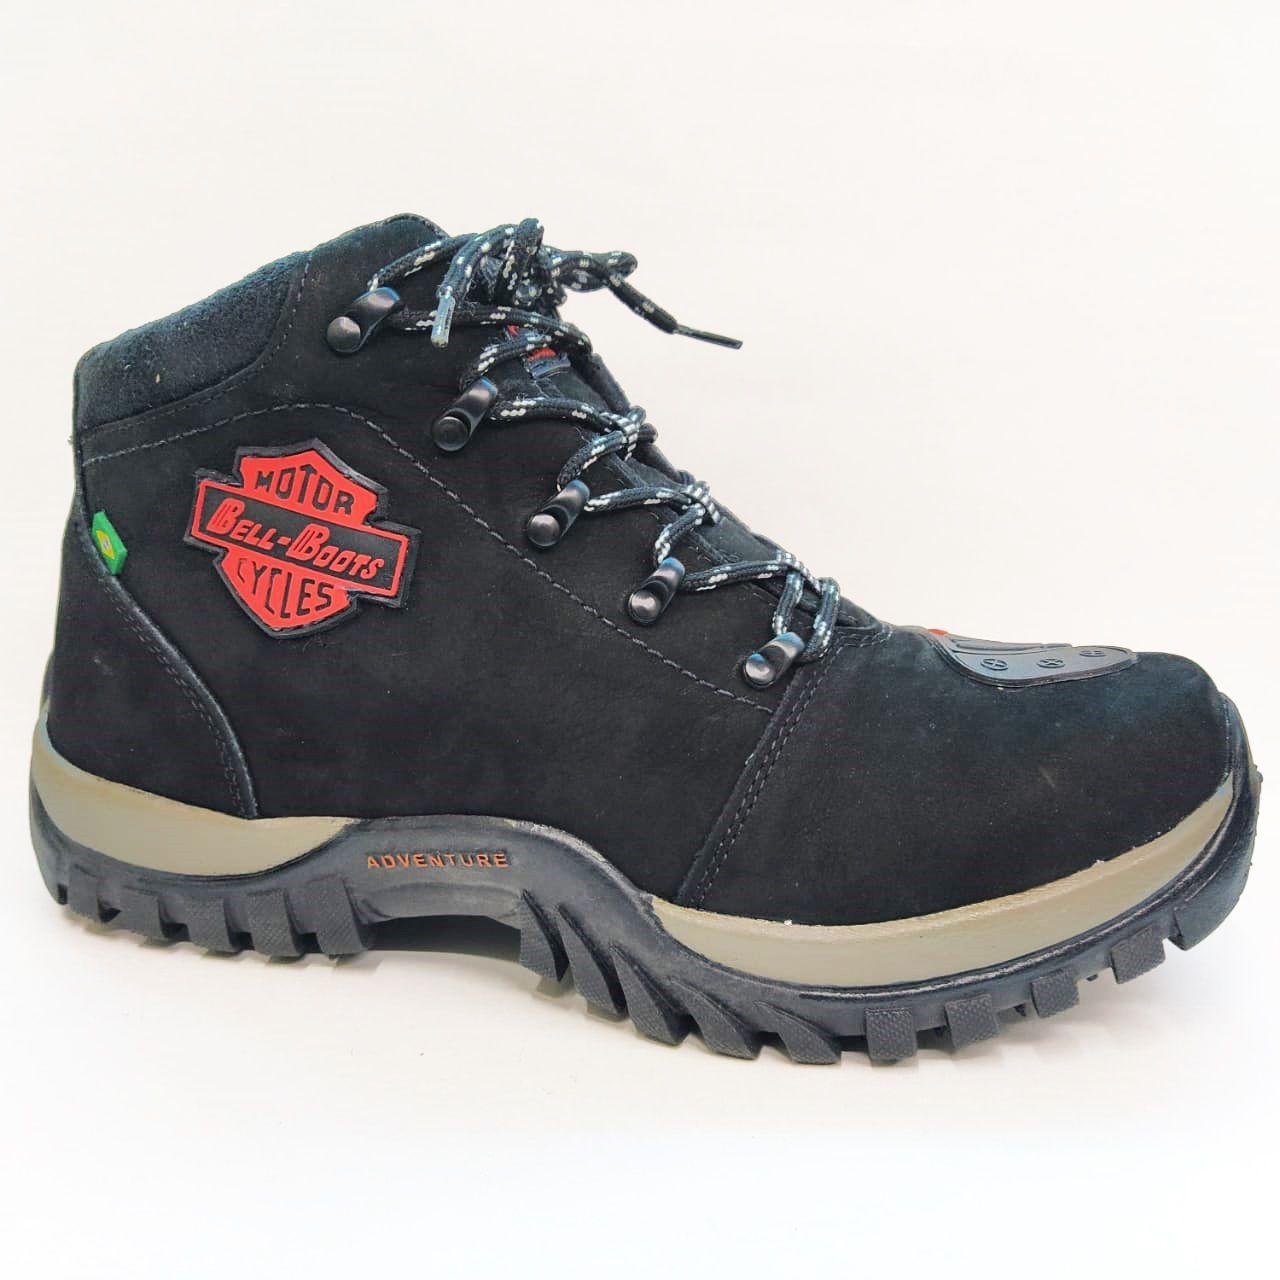 Coturno Masculino Bell Boots 2027 - Preto / Vermelho